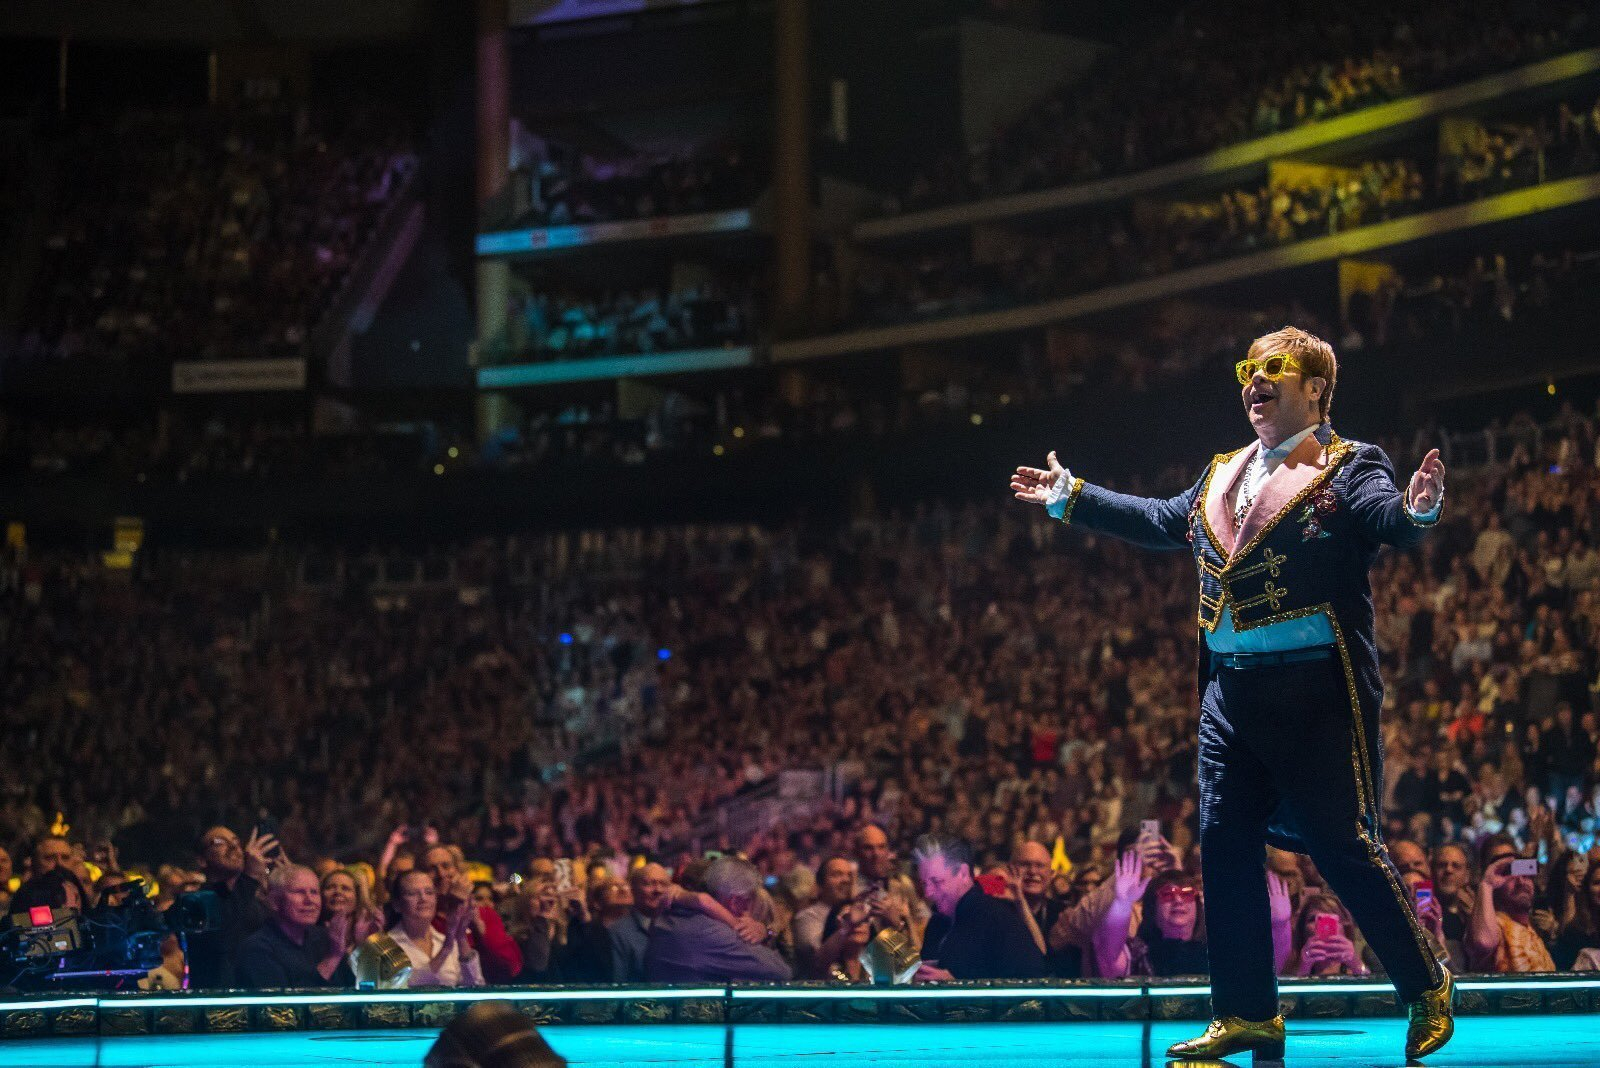 Elton John performs at Gila River Arena in Glendale, AZ on January 26, 2019. Photo courtesy of the artist.